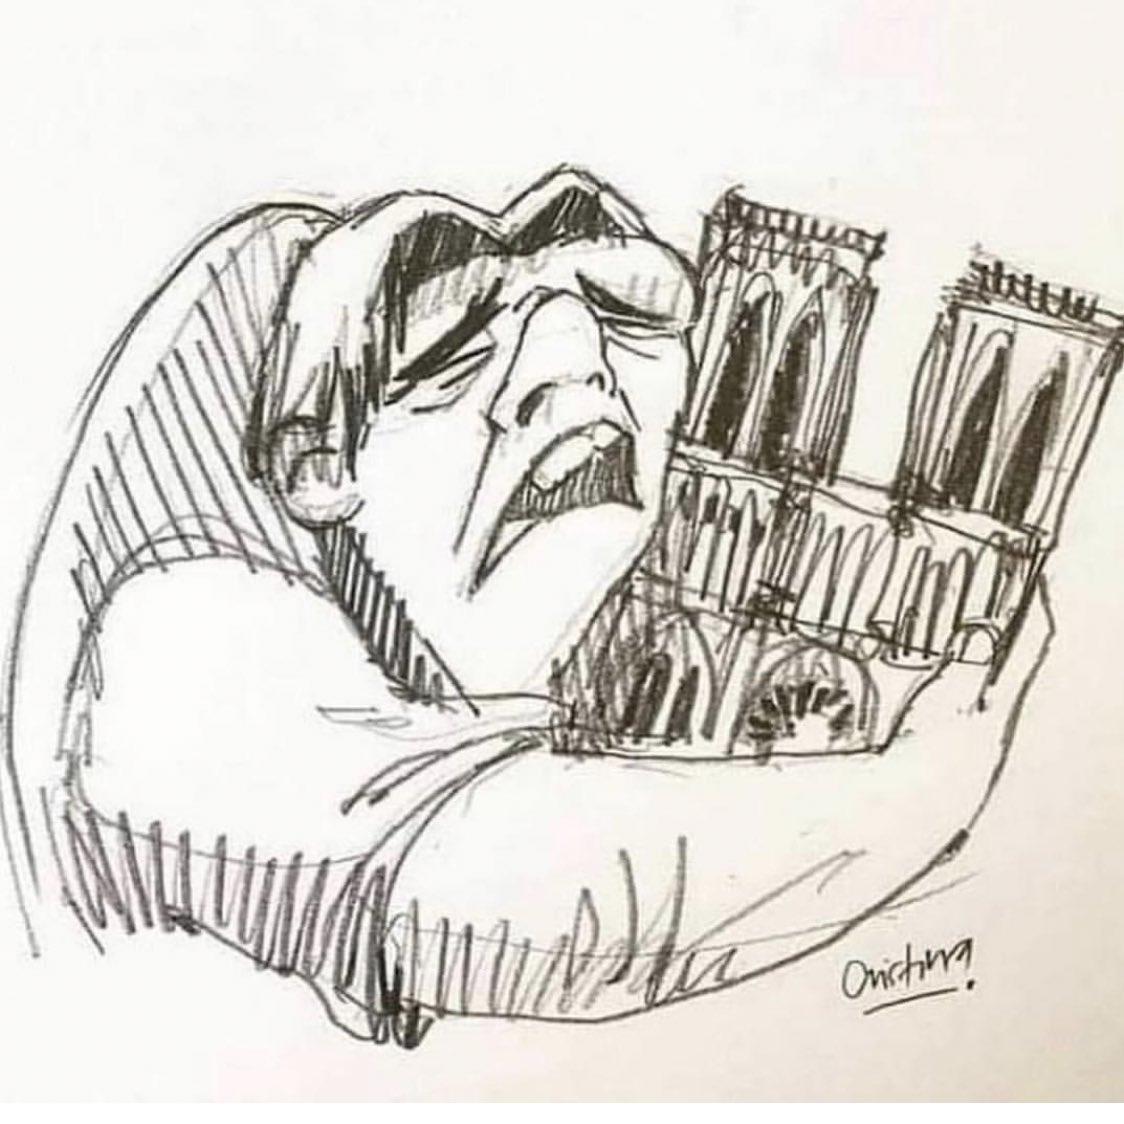 RT @AruanFelix: 😢💙 #PrayForNotreDame https://t.co/5se2DxH3YK